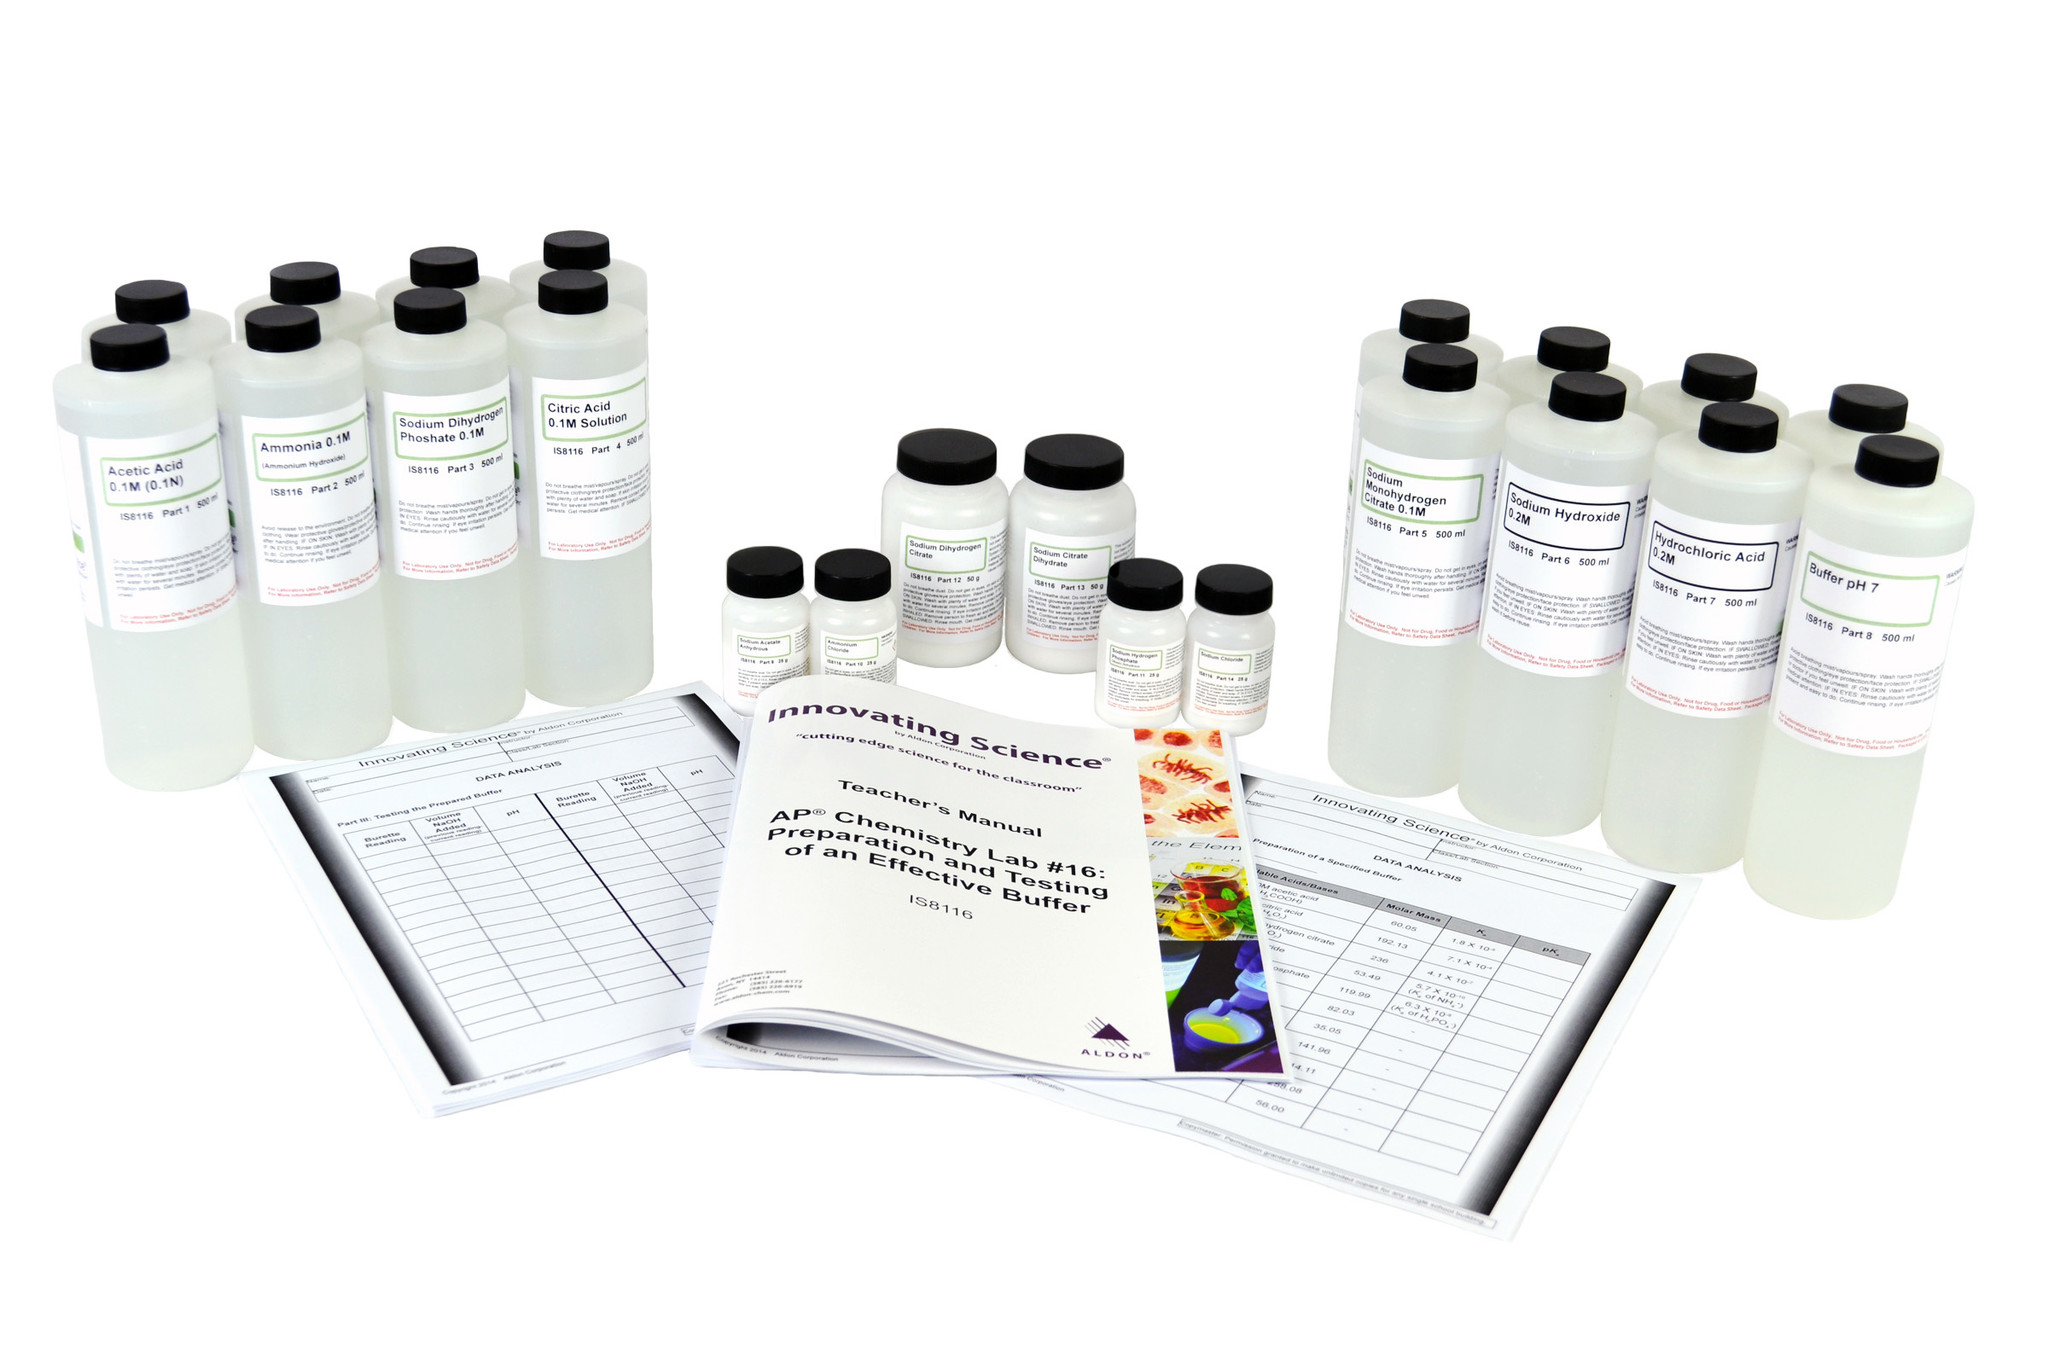 Aldon IS8116 AP® CHEMISTRY LAB #16: PREPARATION OF EFFECTIVE BUFFERS